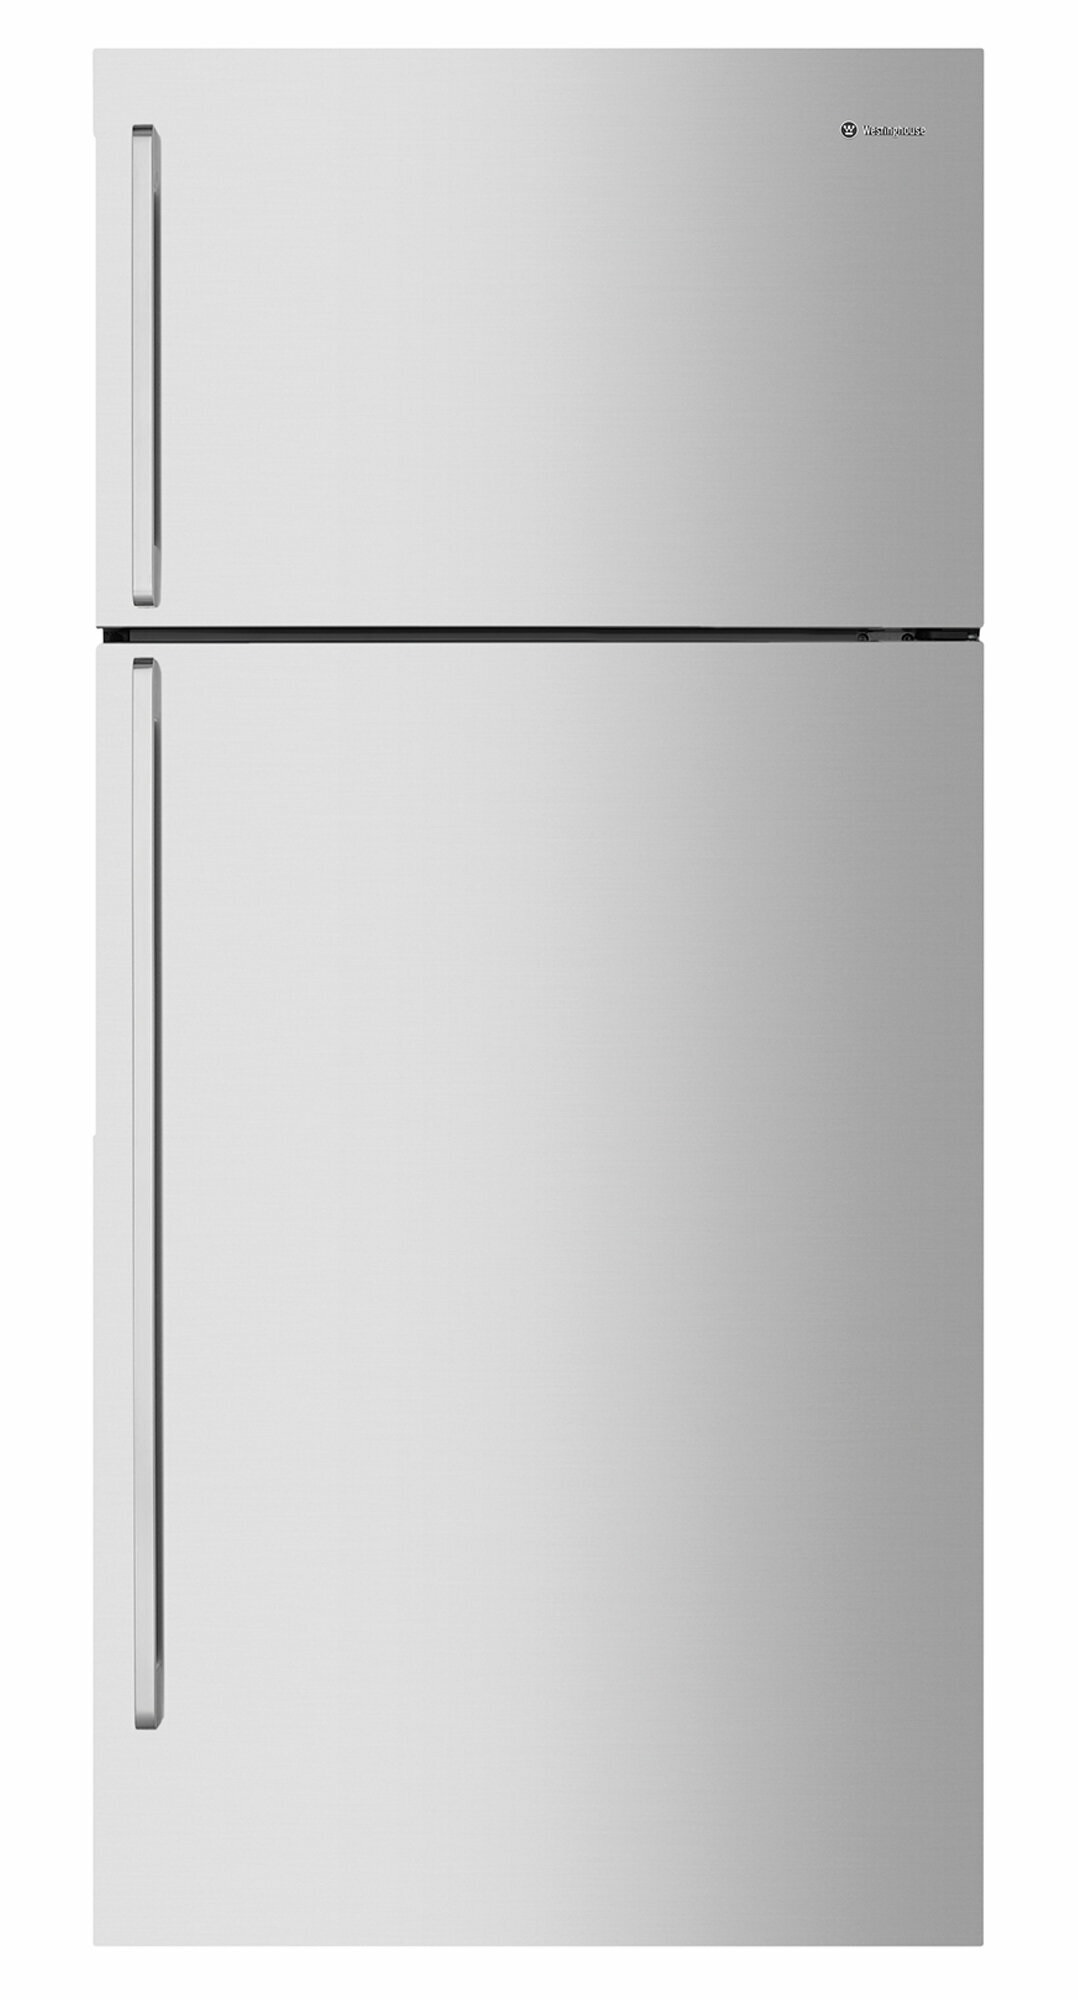 Westinghouse WTB5404SC-R Refrigerator